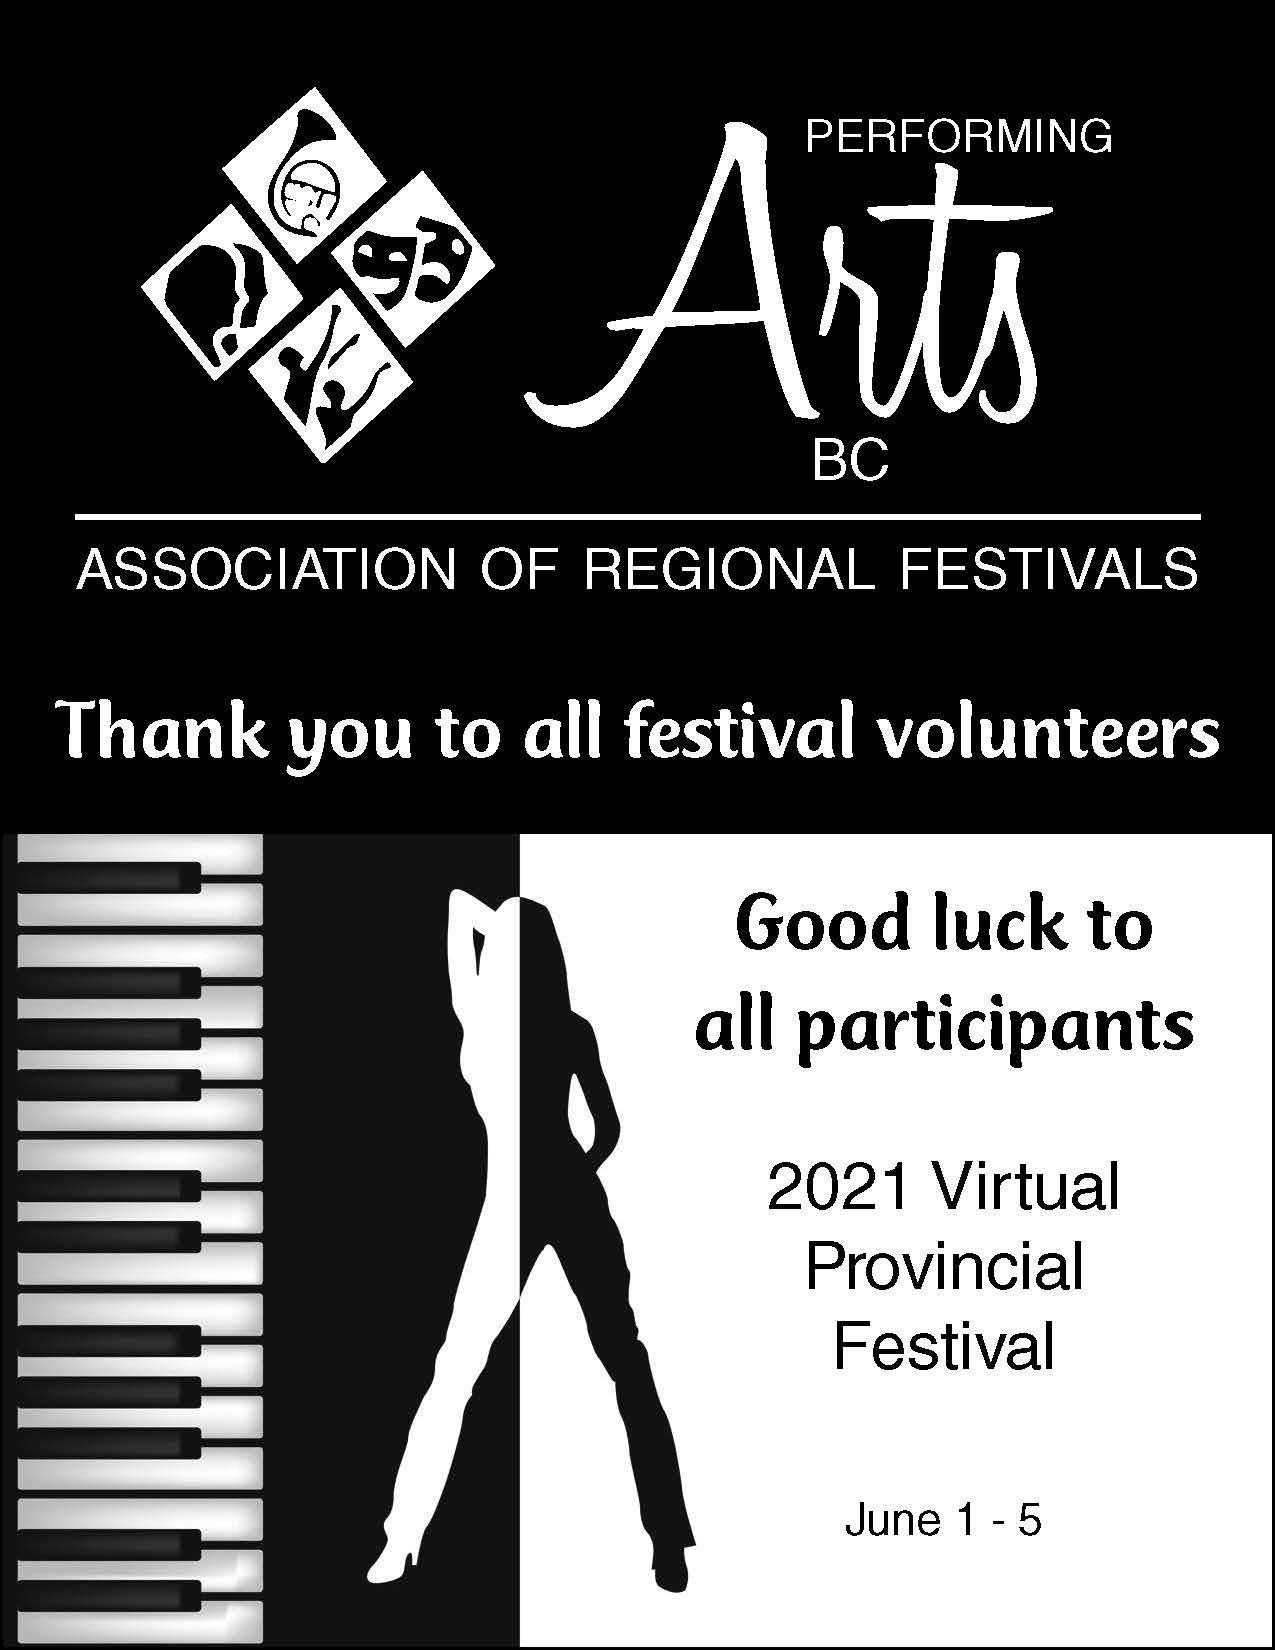 Ad 2021 - QtrPg Vert Performing Arts-BW